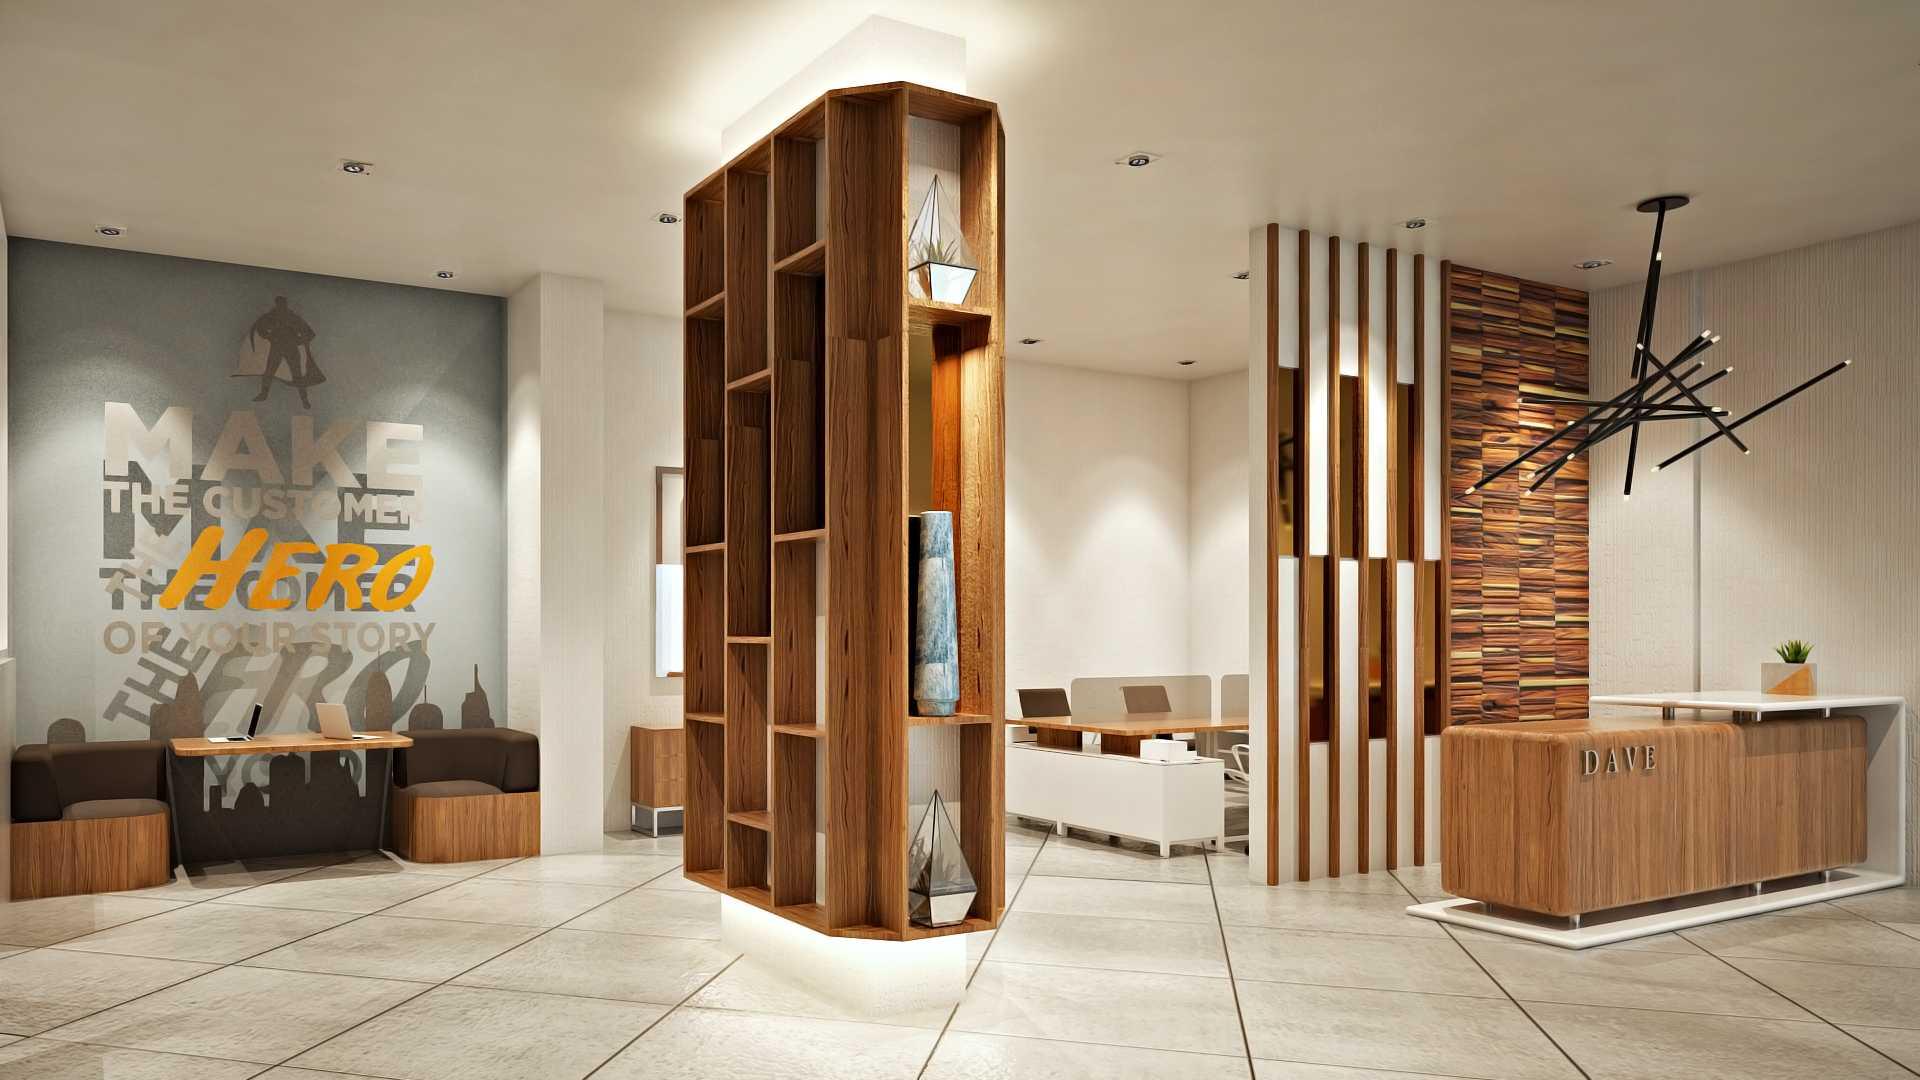 Hive Design & Build Dave Depok Depok Marketing Office Modern  25961